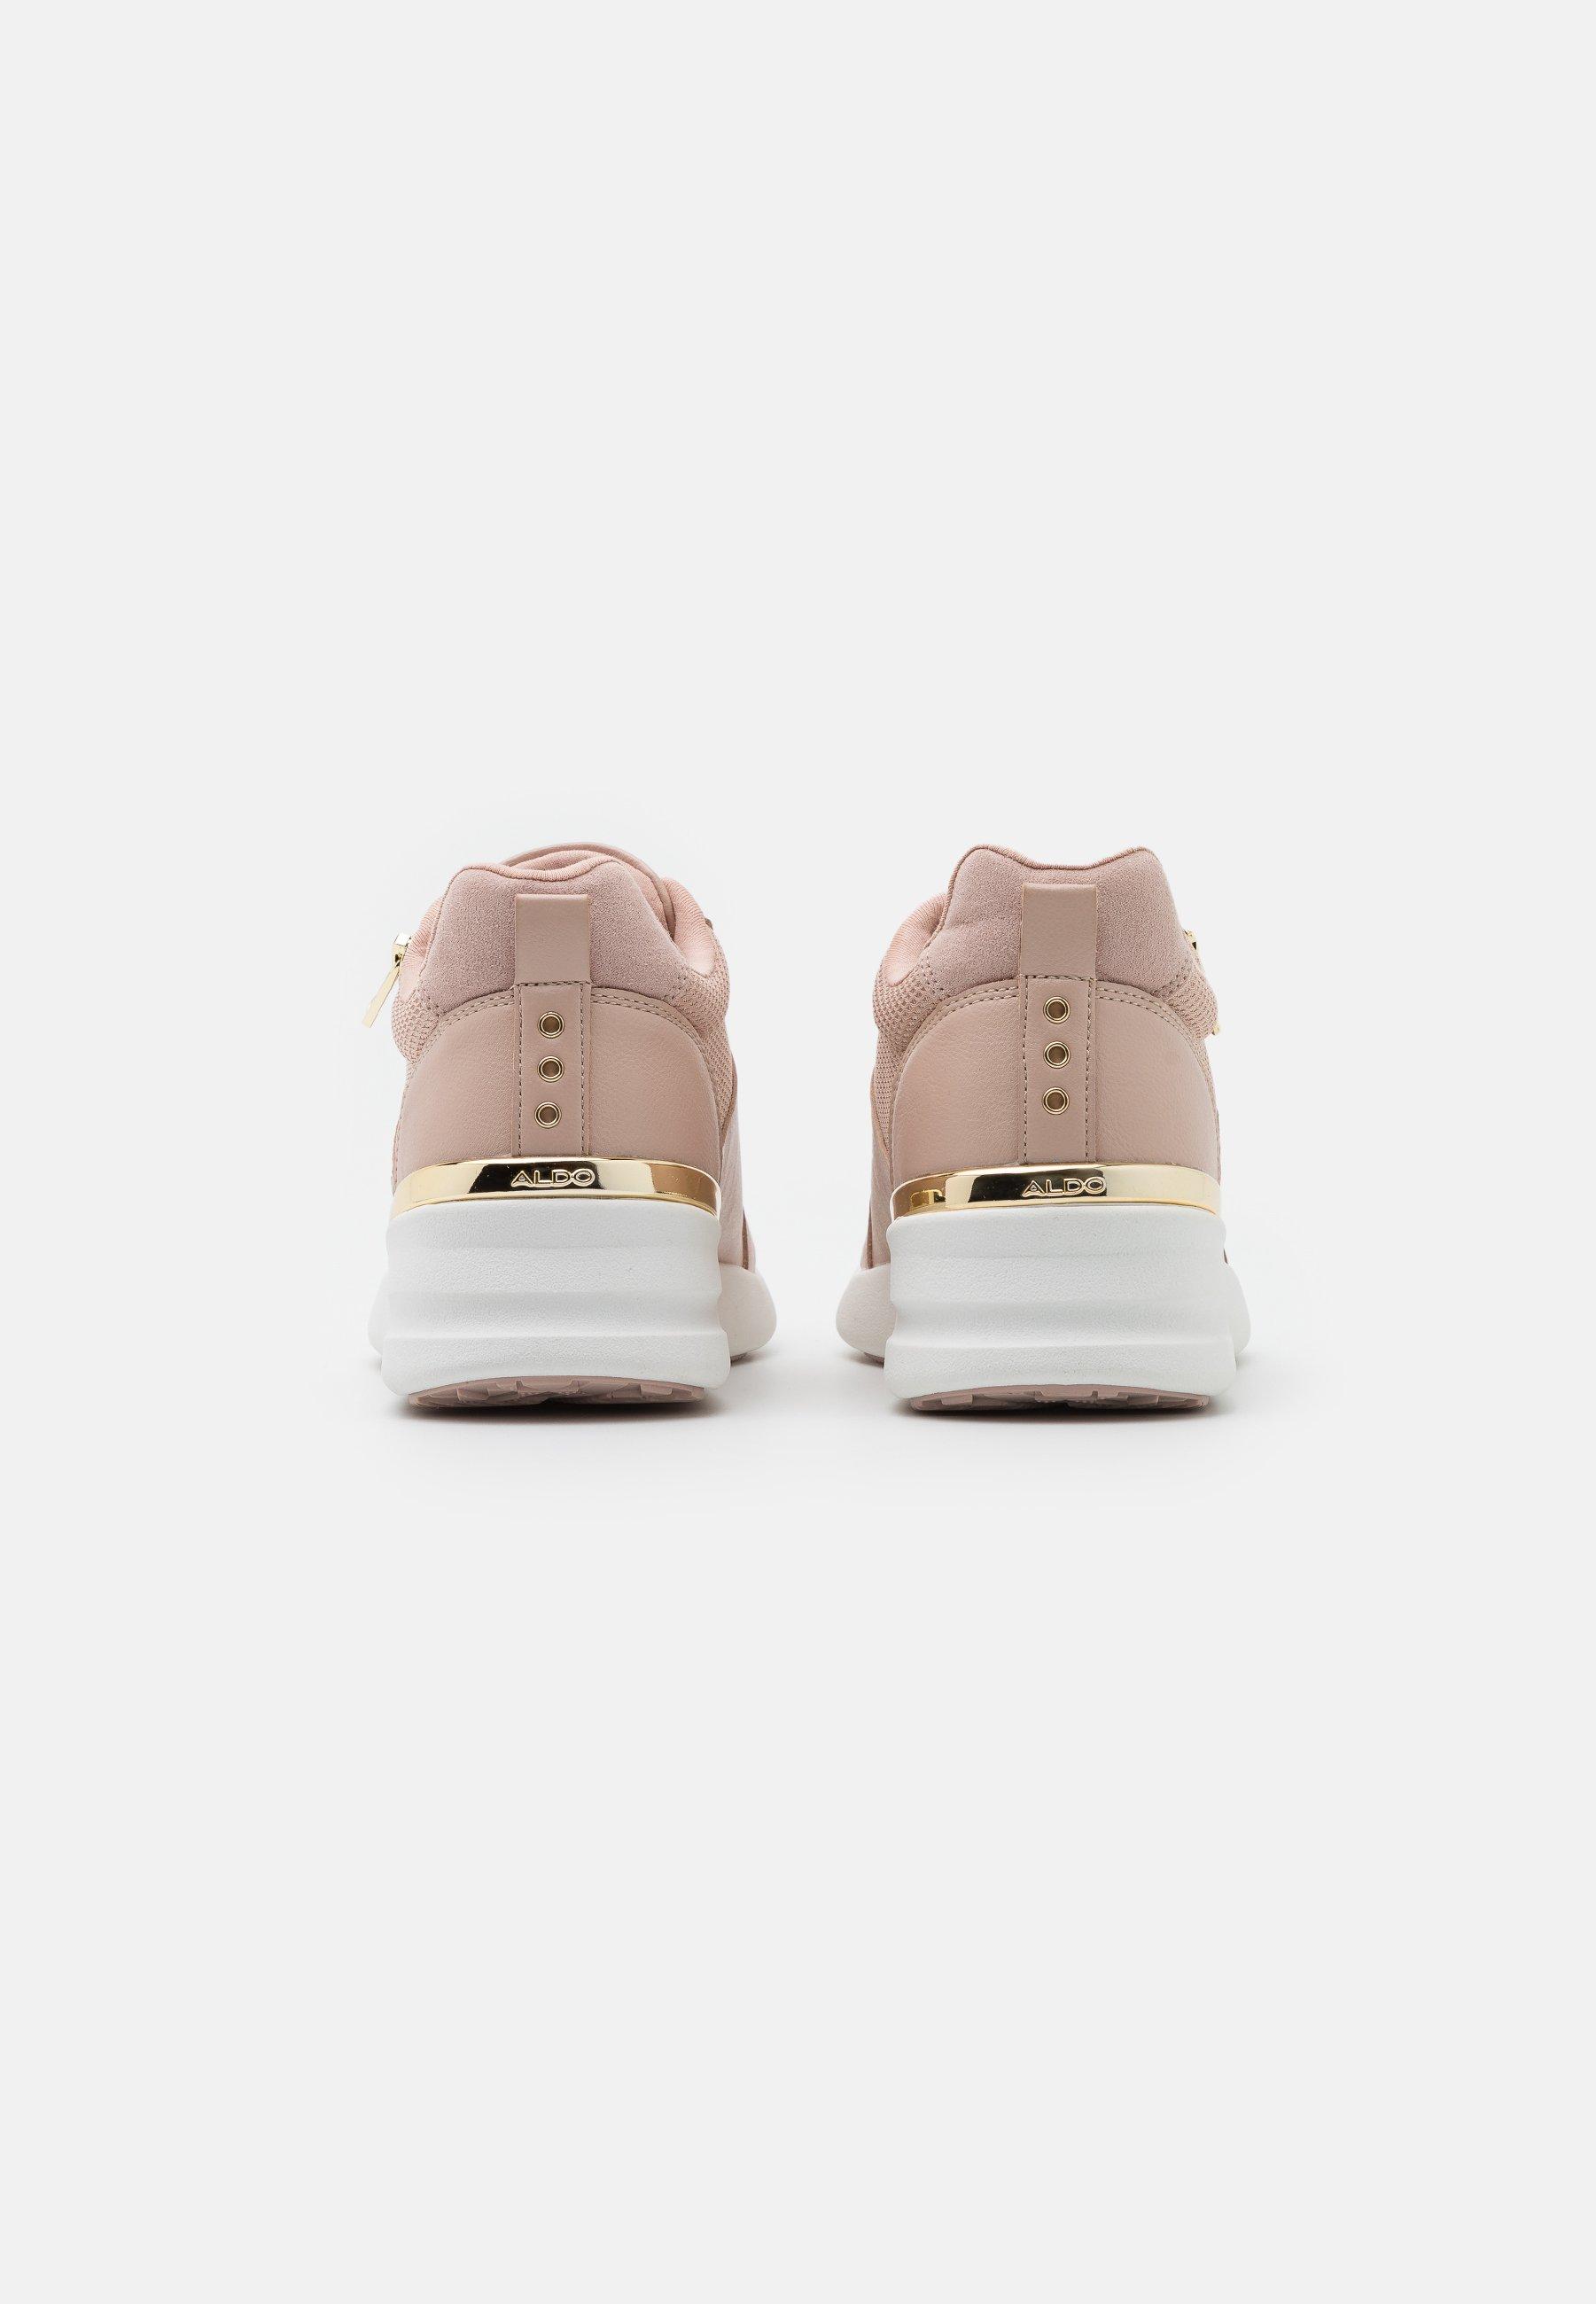 Limited New New Arrival Women's Shoes ALDO TRAISEN Trainers light pink kDooyAV7h t8qPyEzPl